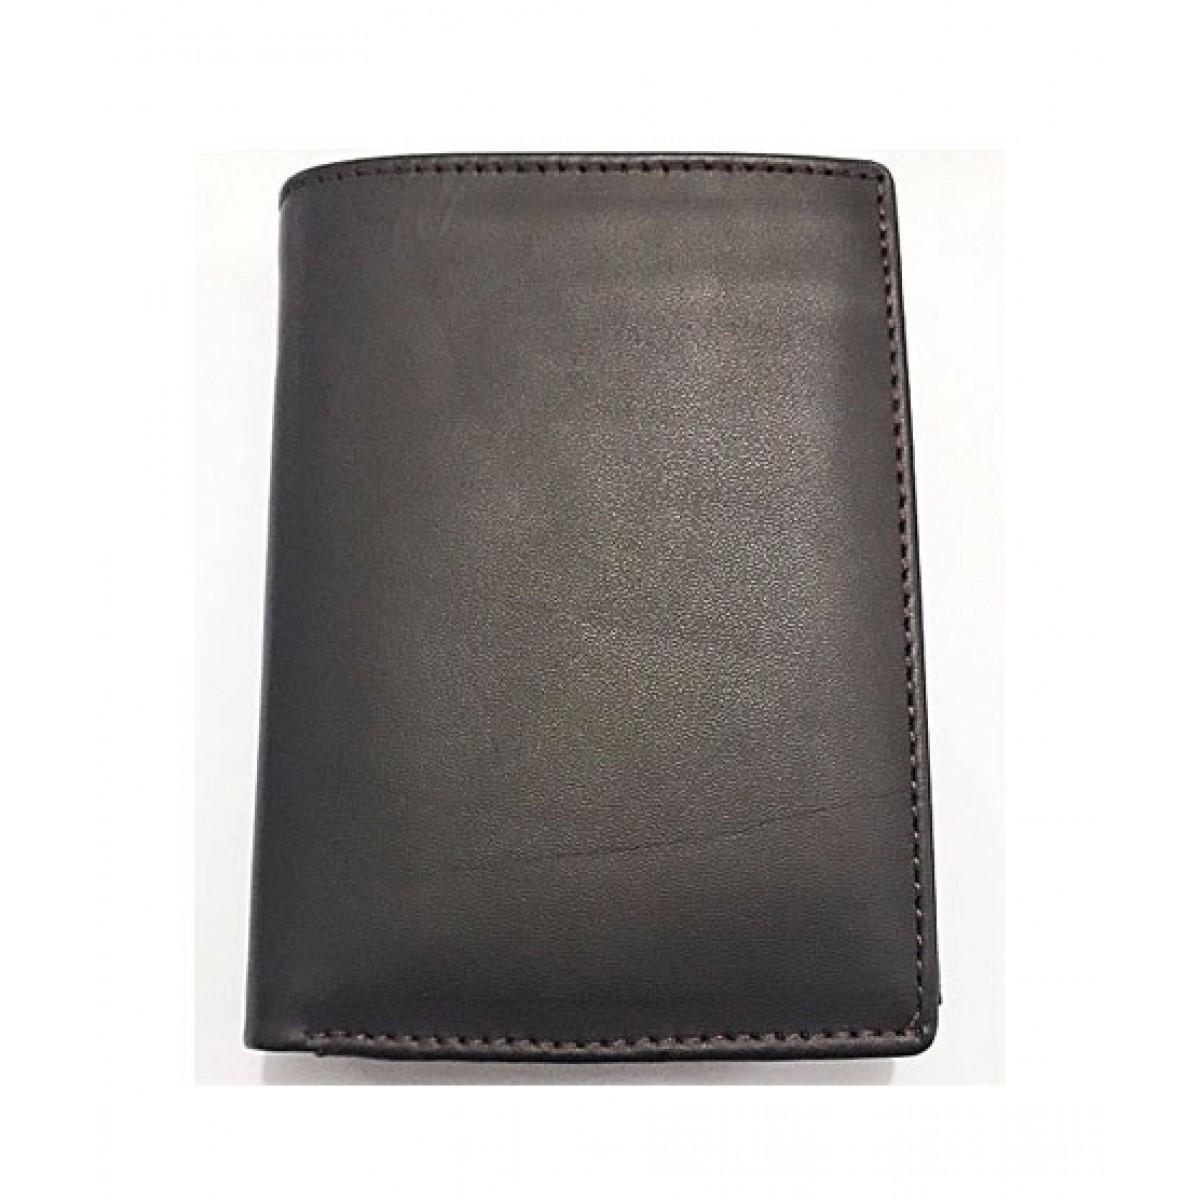 Eizybuy Original Cow Leather Wallet For Men Black